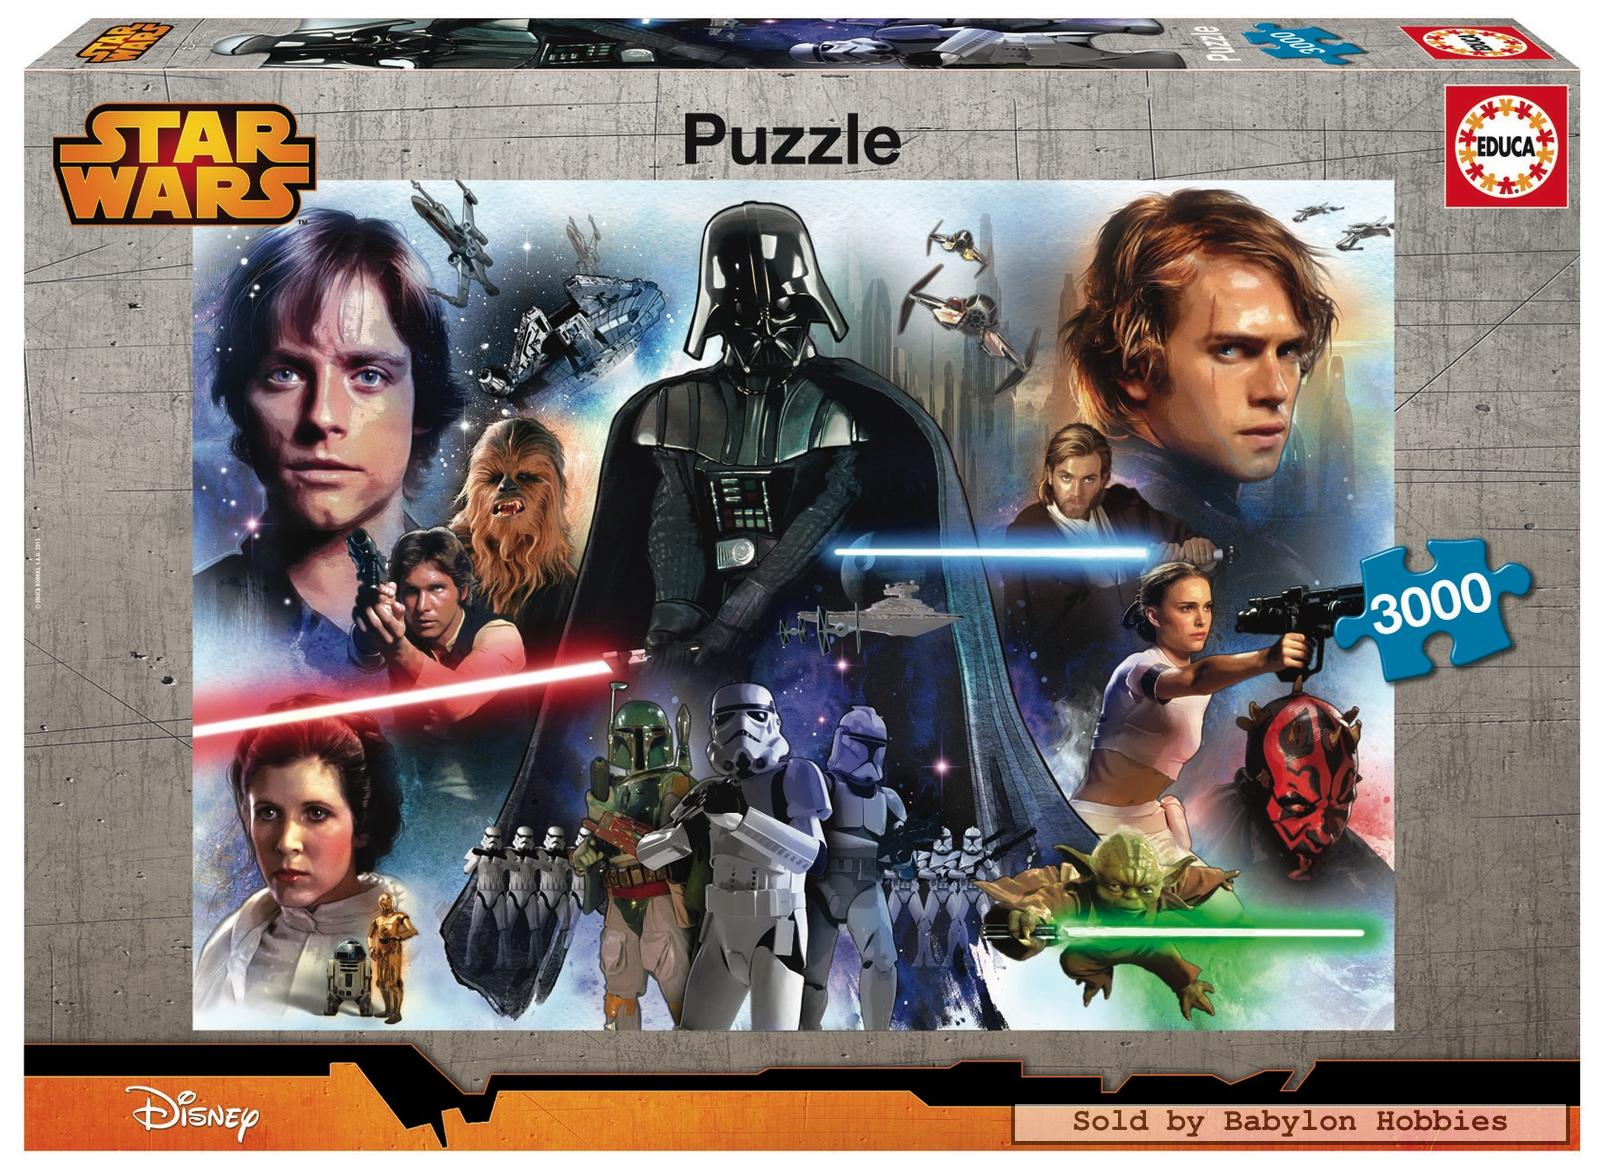 3000 pcs jigsaw puzzle star wars star wars educa 16321 ebay. Black Bedroom Furniture Sets. Home Design Ideas